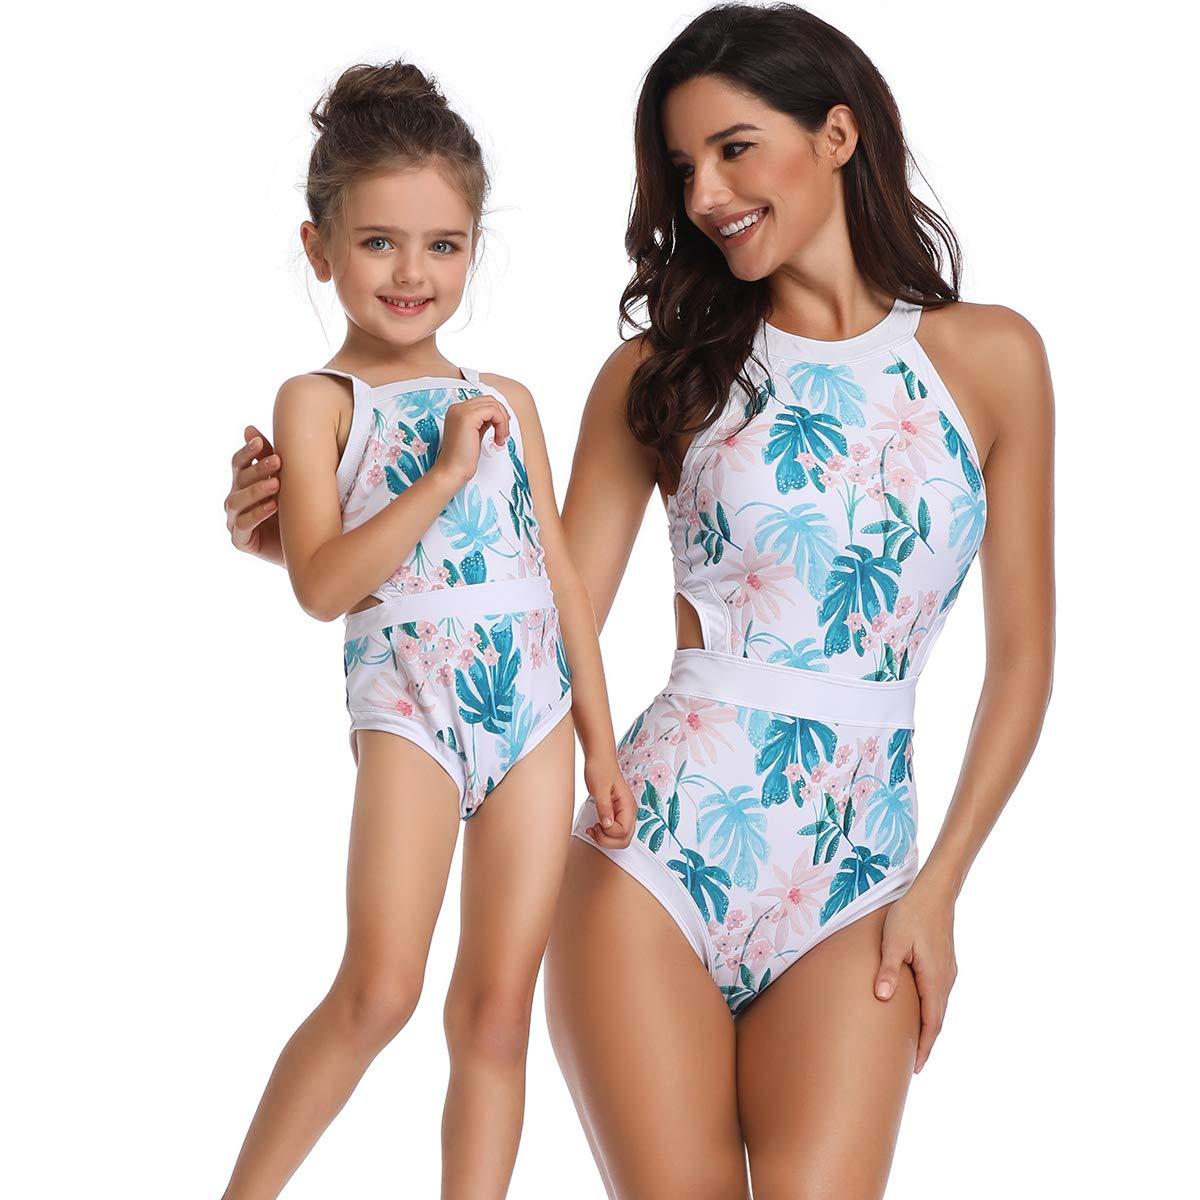 Mère-Fille Correspondant Maillot de Bain Bikini Famille Assorti au vêtement de Bain Tenues Beachwear Swimwear Maillot Chic Natation Surf Spa Trikini Push Up Tankini Swimsuit pour Maman et Fille